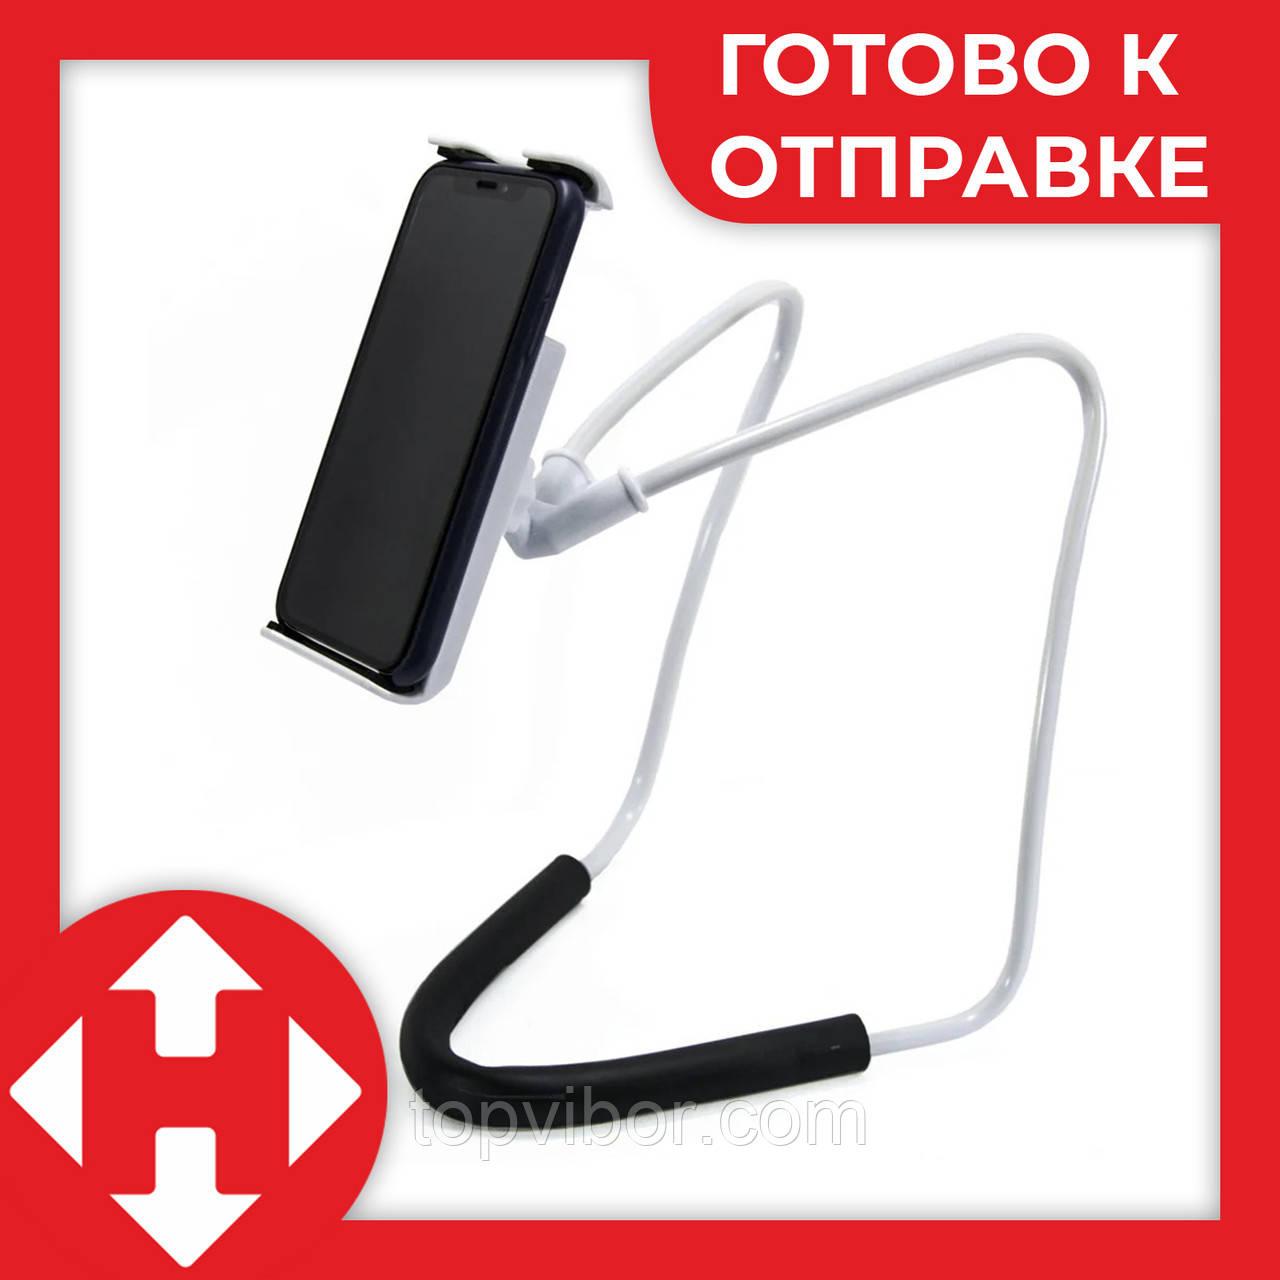 Гибкий держатель для смартфона, Lazy Bracket, автодержатель для телефона Белый